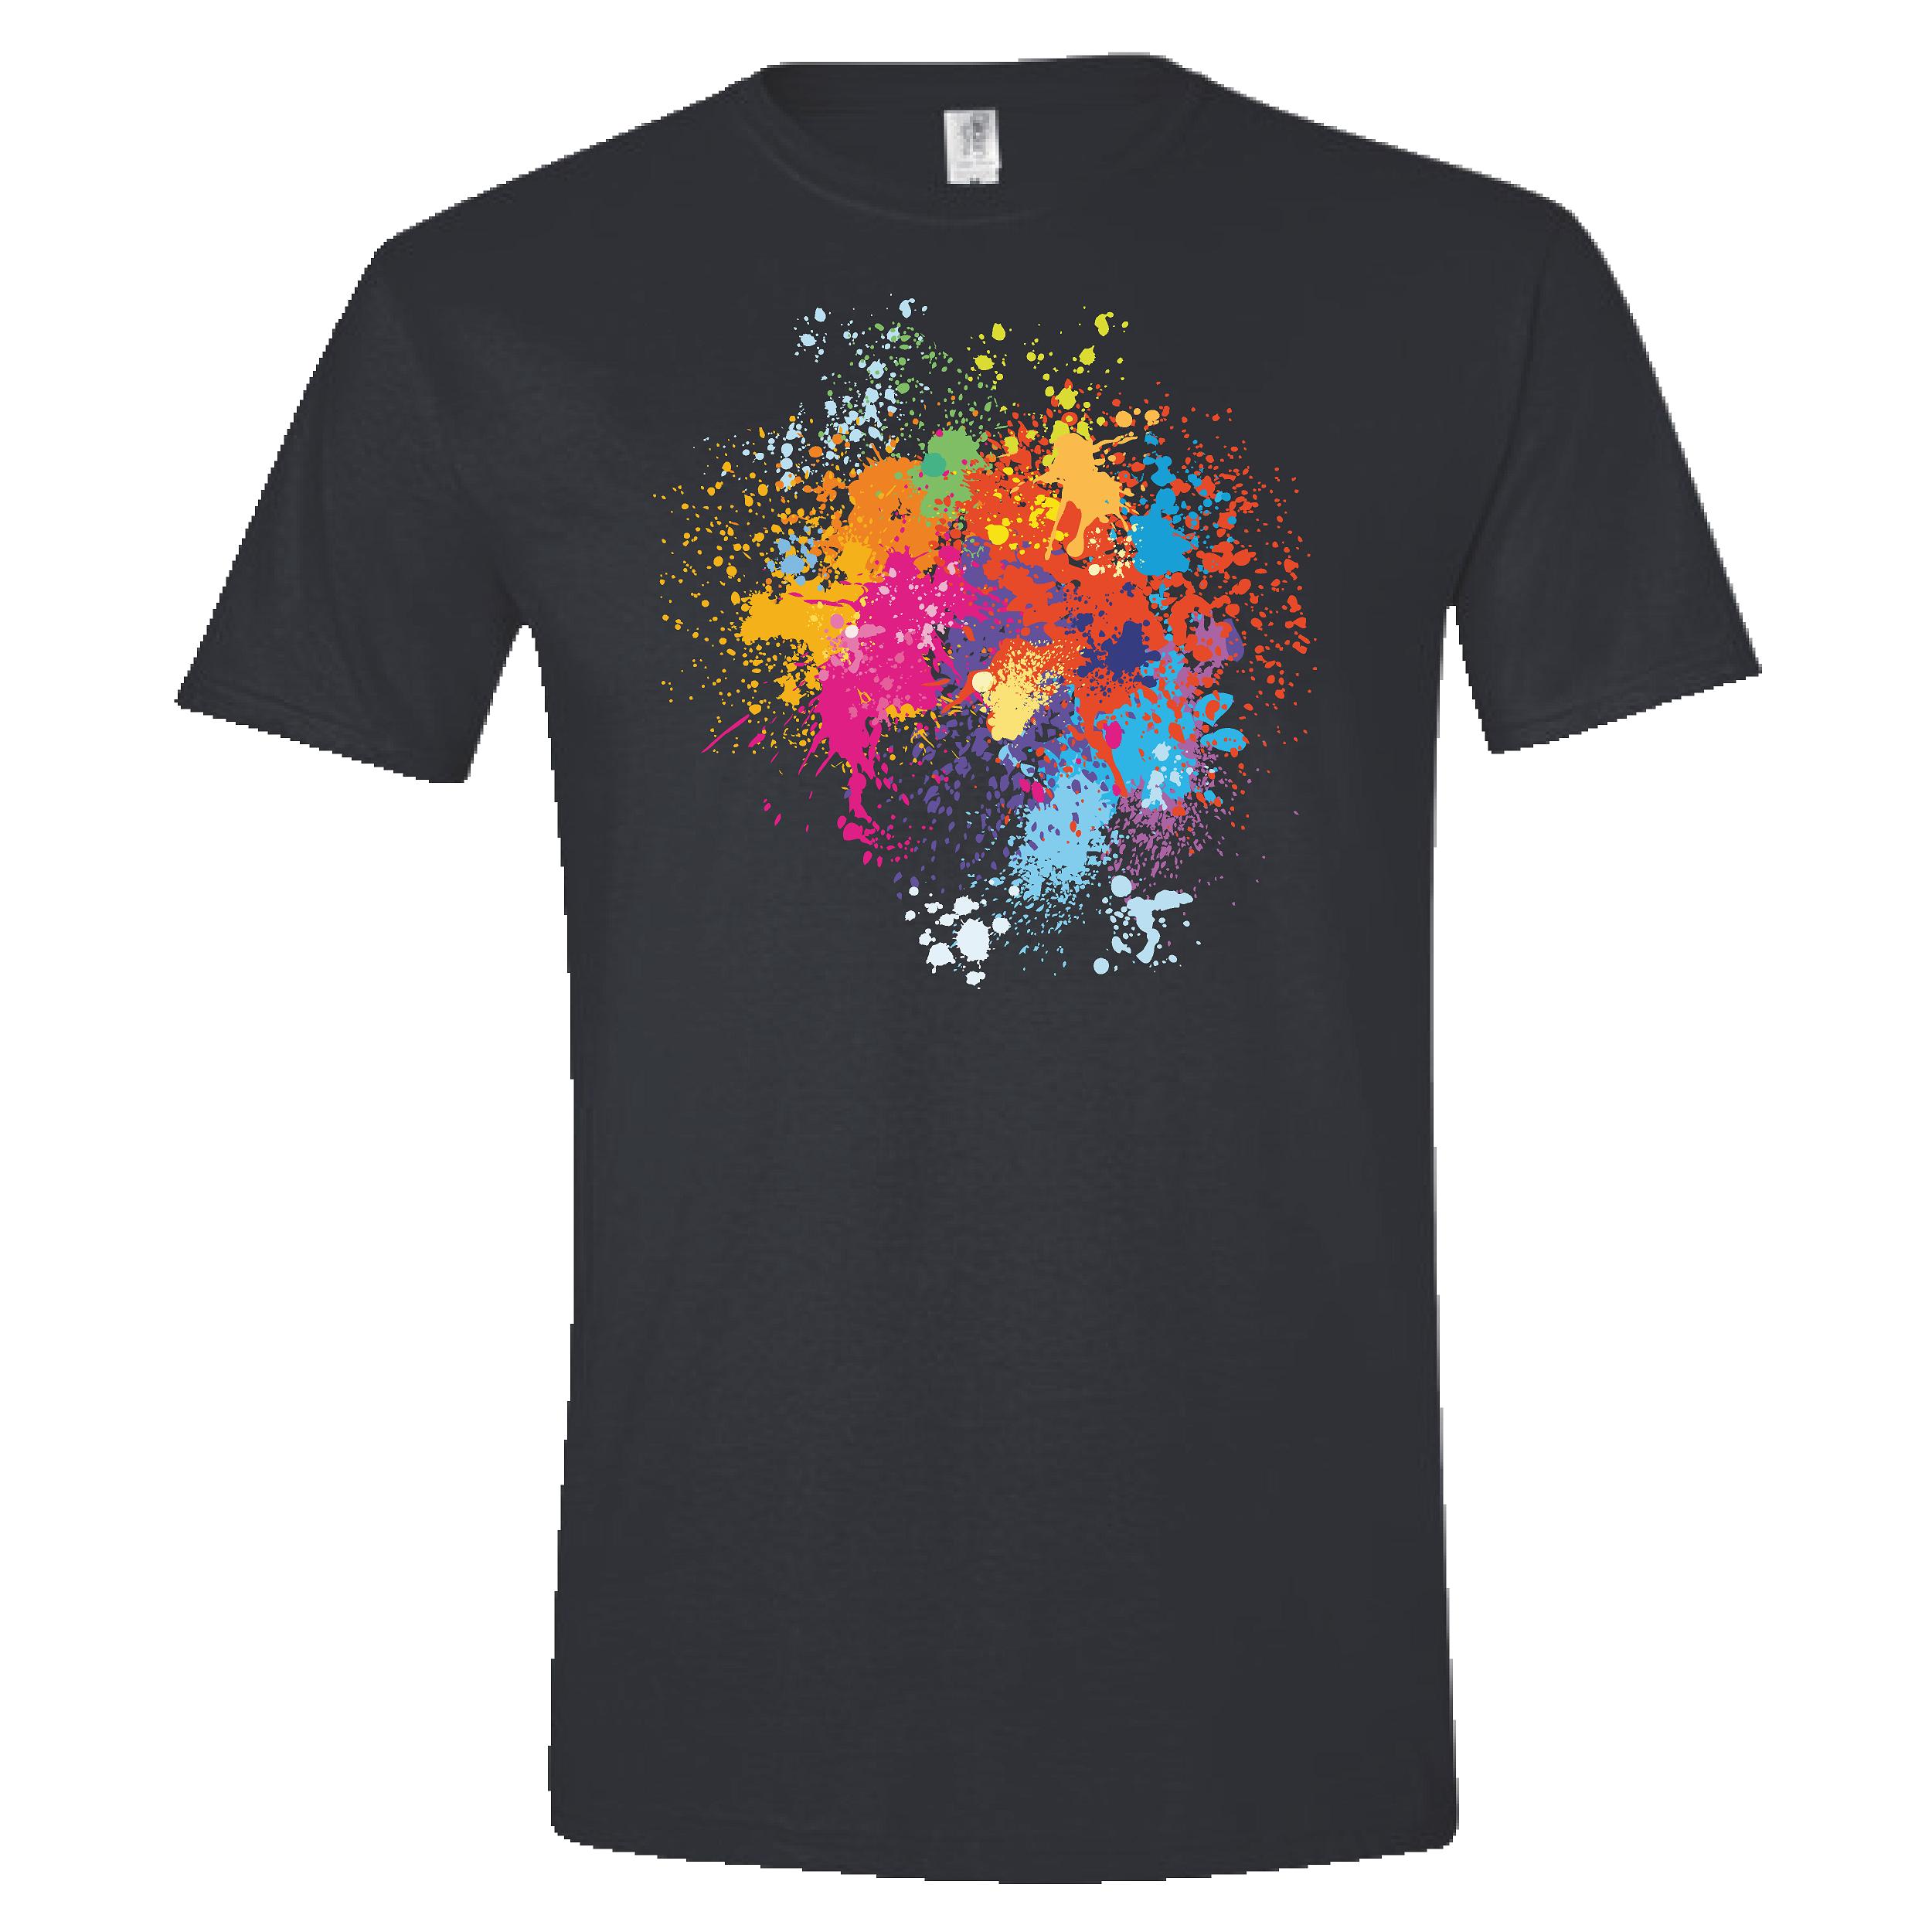 black t-shirt with a multi-color paint splatter